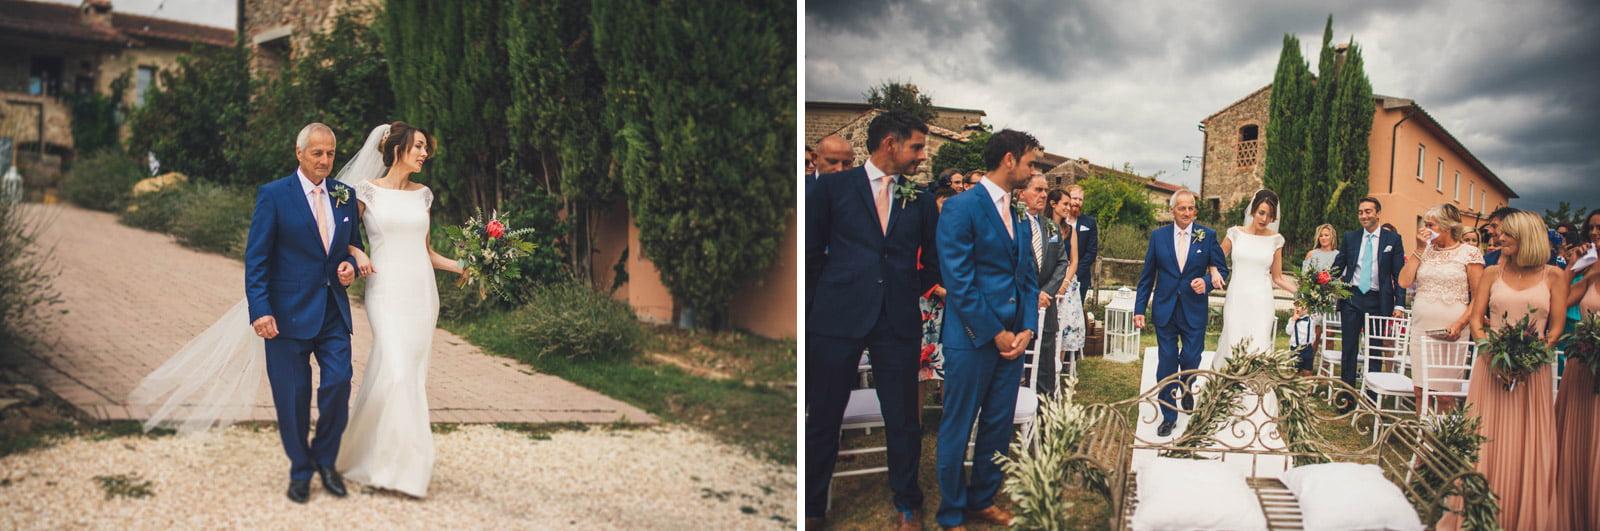 046-wedding-tuscany-san-galgano-federico-pannacci-photographer